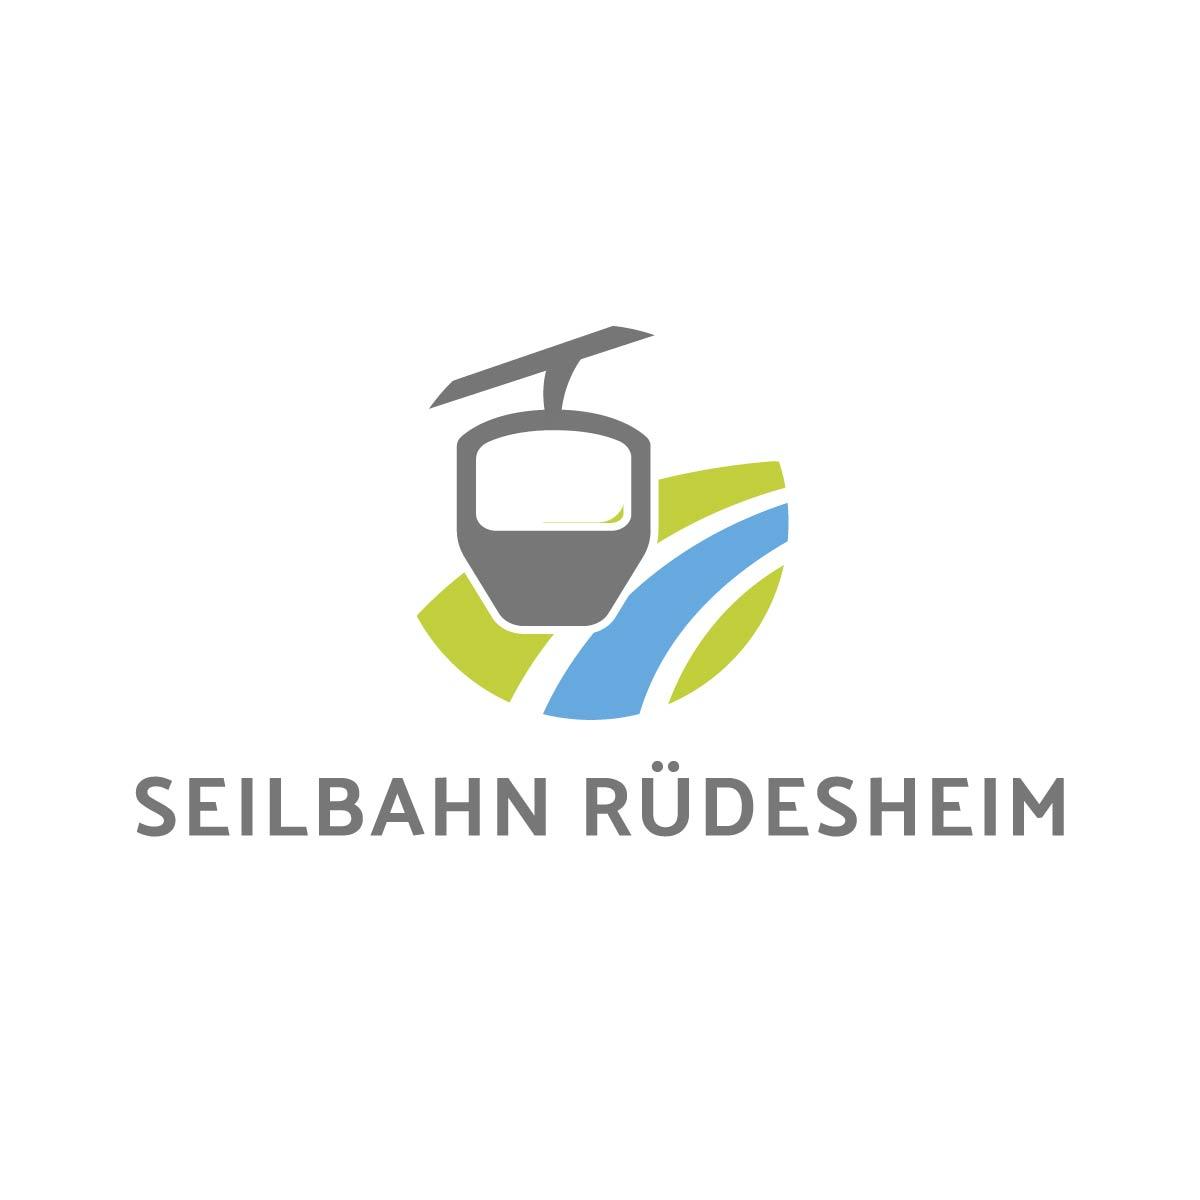 Icon Signet Ruedesheim Seilbahn Print Web